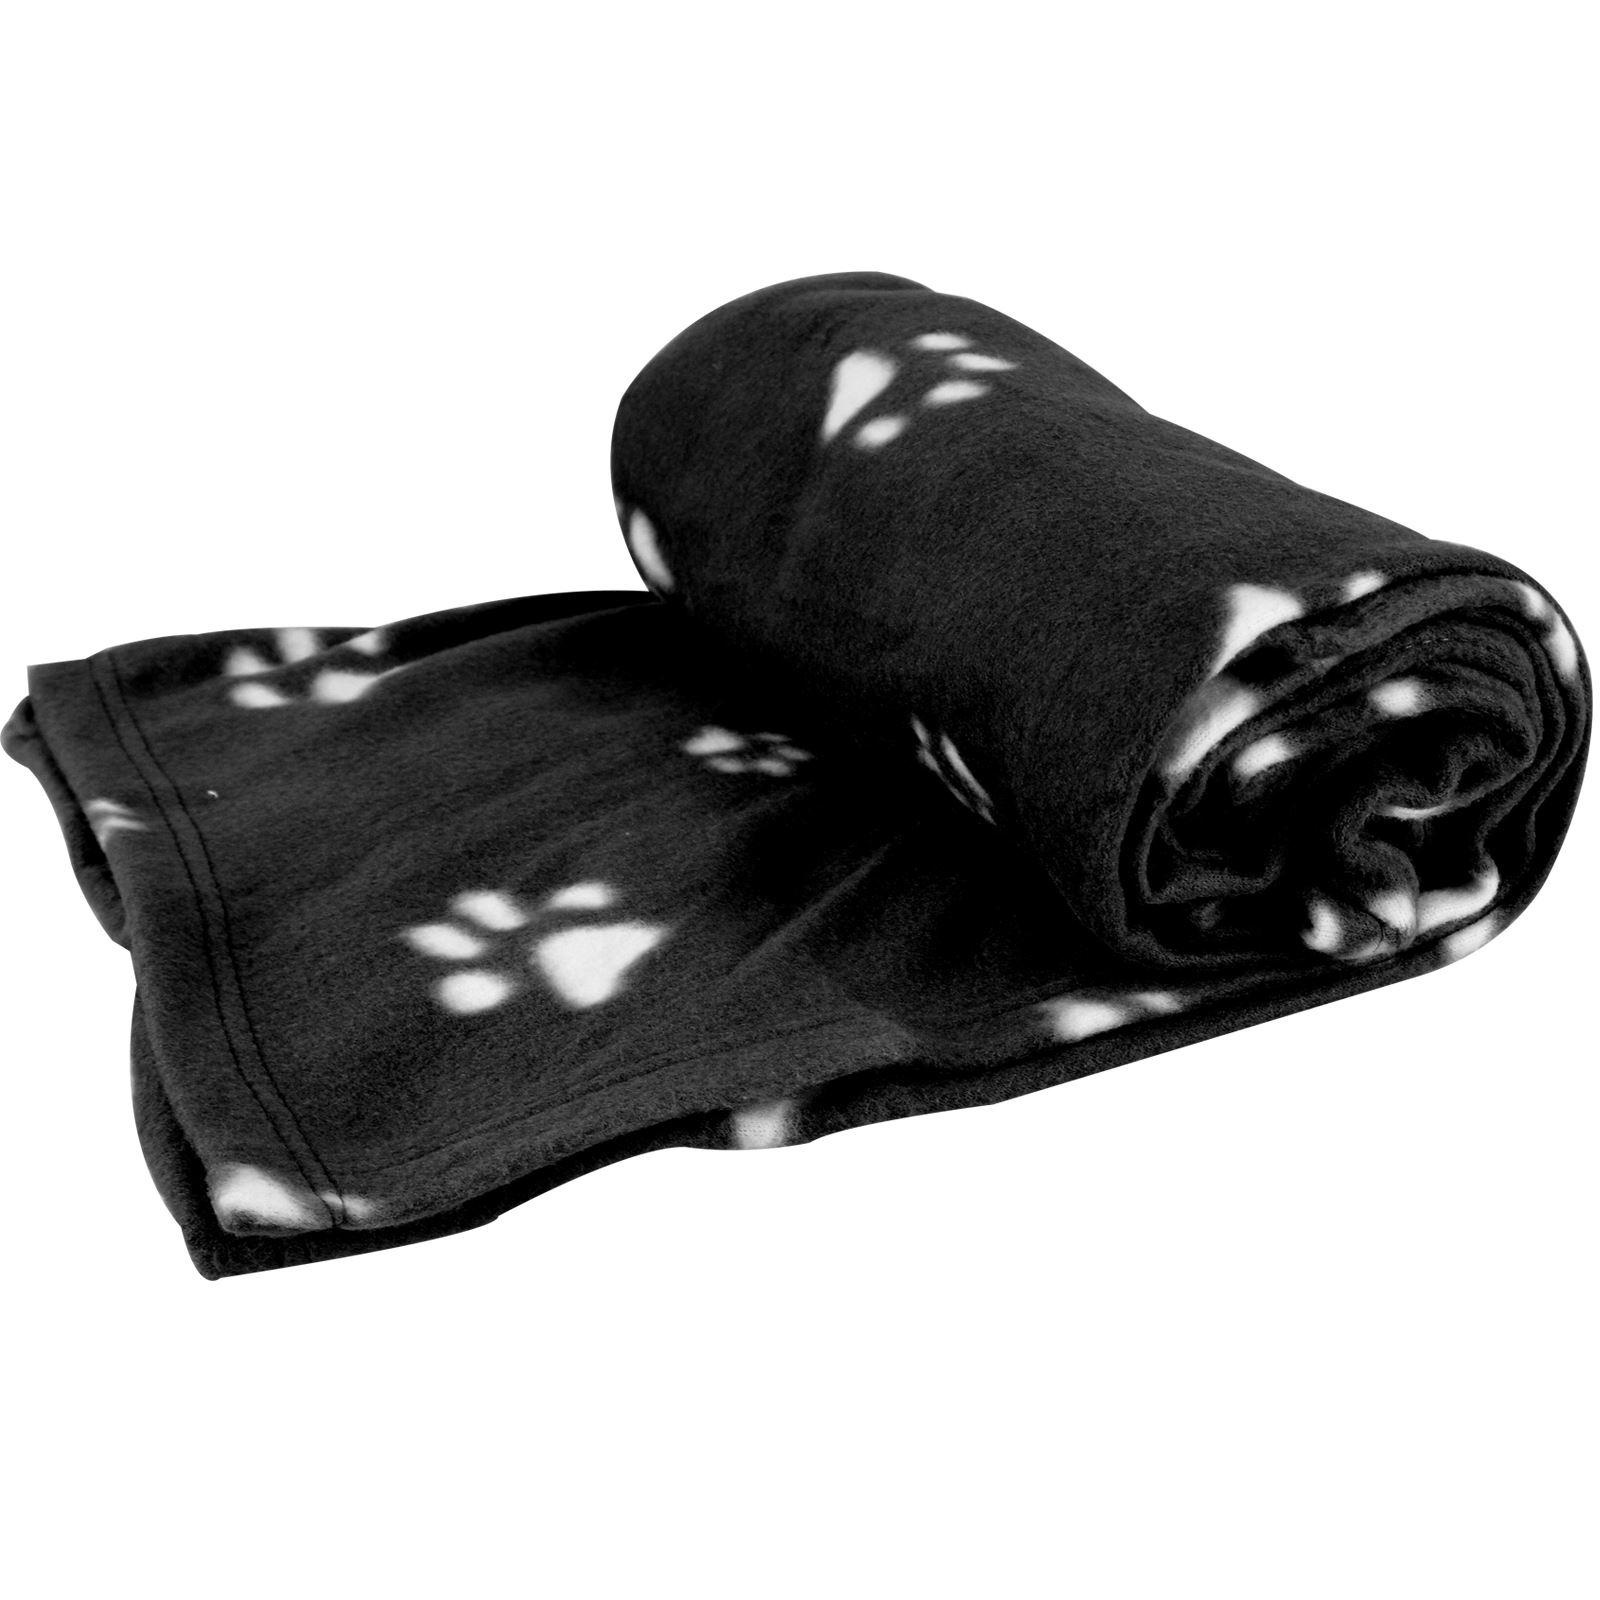 Warm-Pet-Mat-Paw-Print-Cat-Dog-Puppy-Fleece-Soft-Blanket-Bed-Cushion-One-Size thumbnail 7